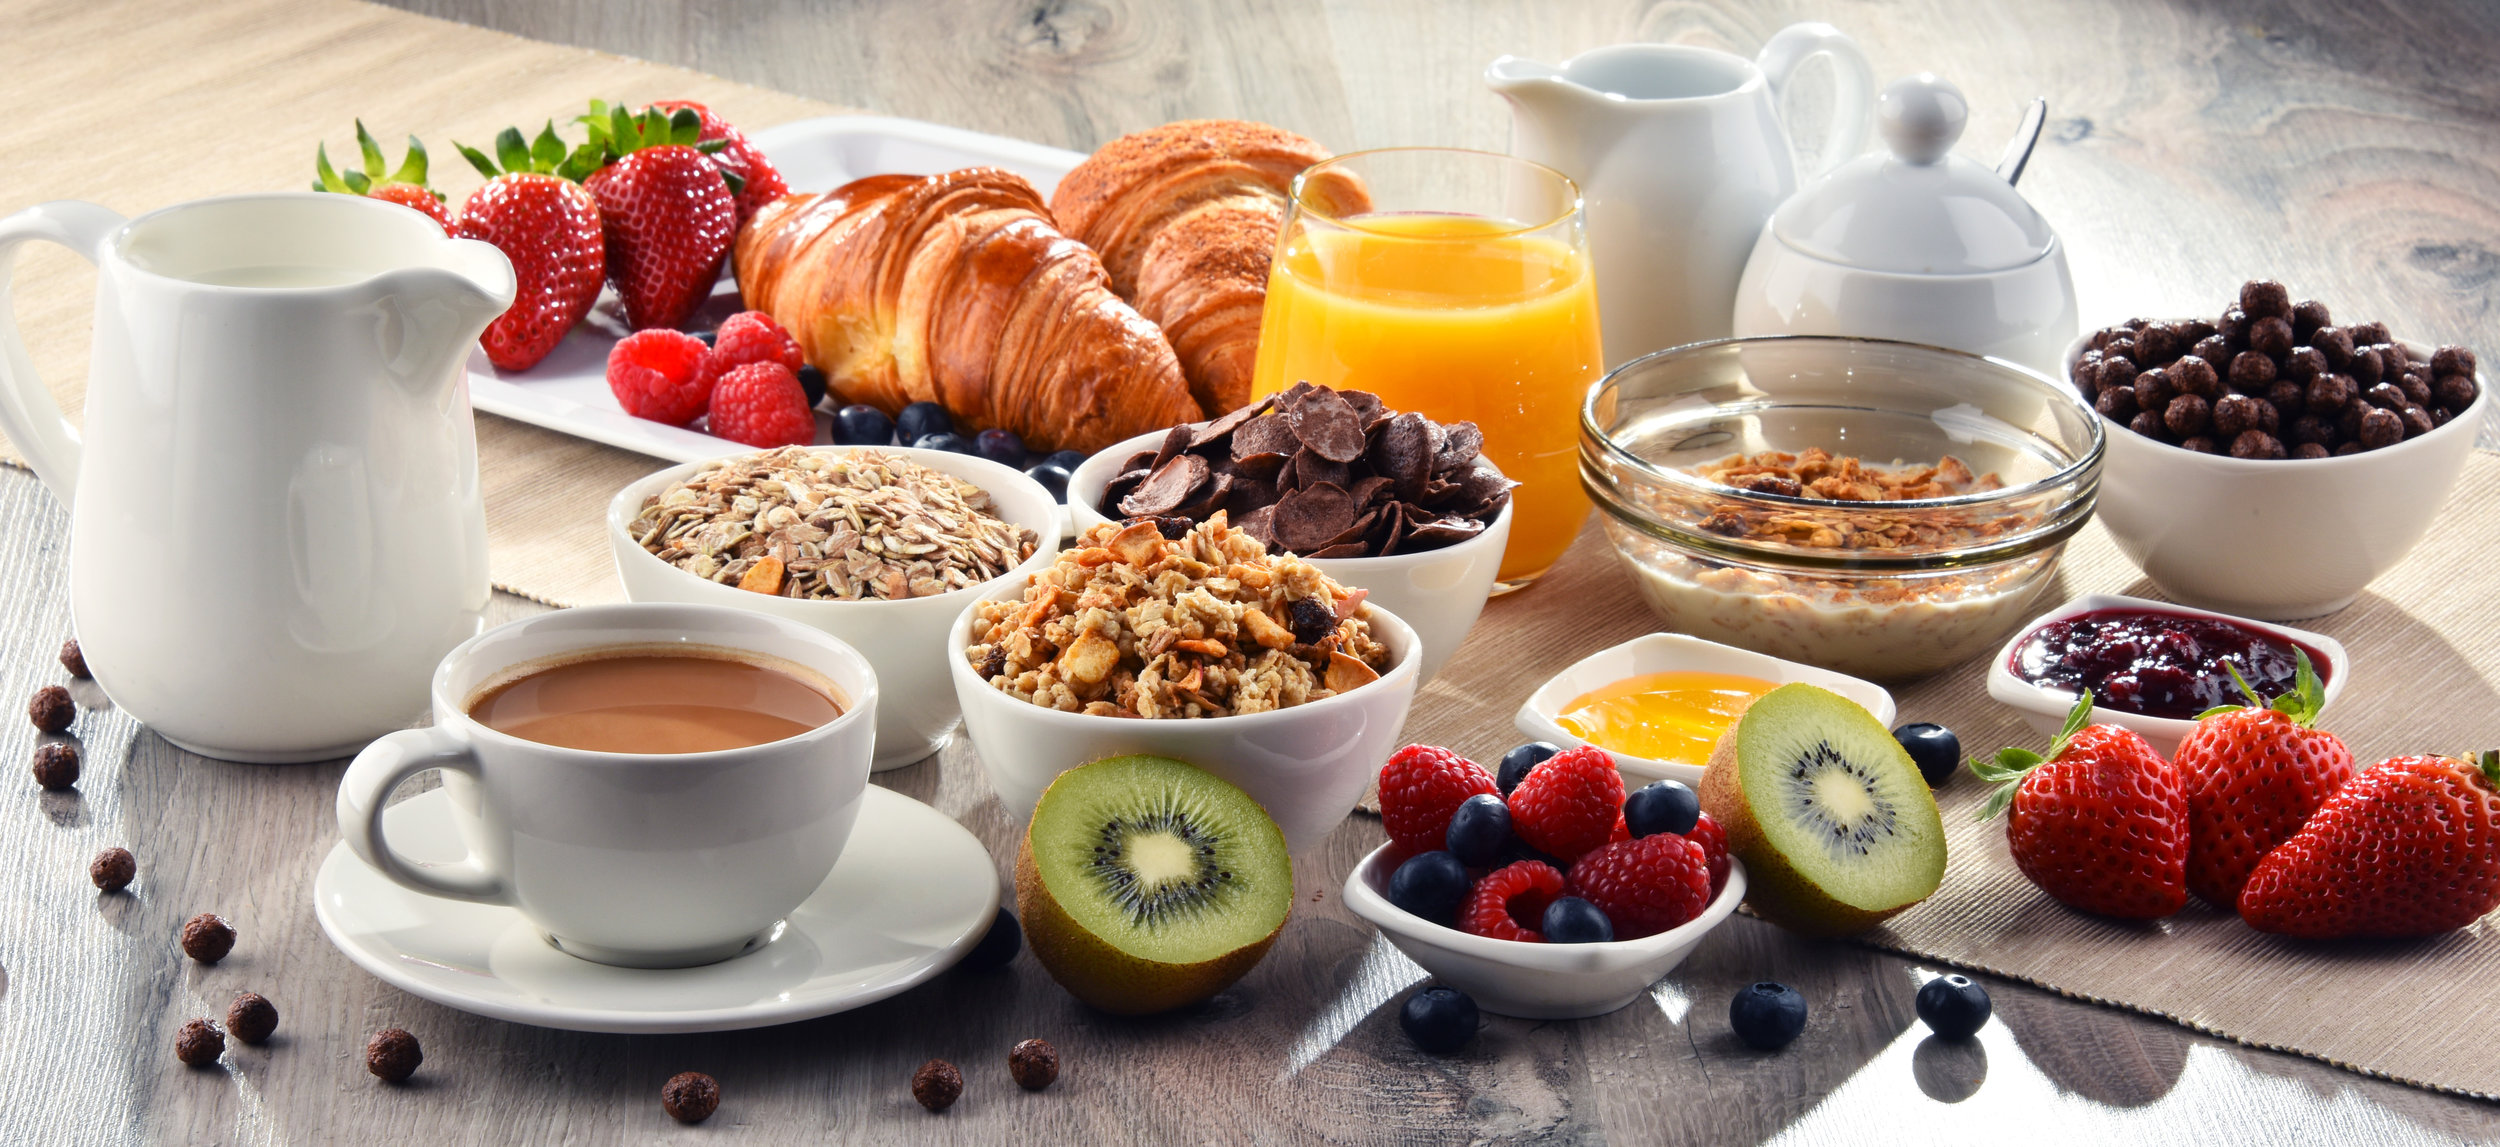 breakfast_culture.jpg